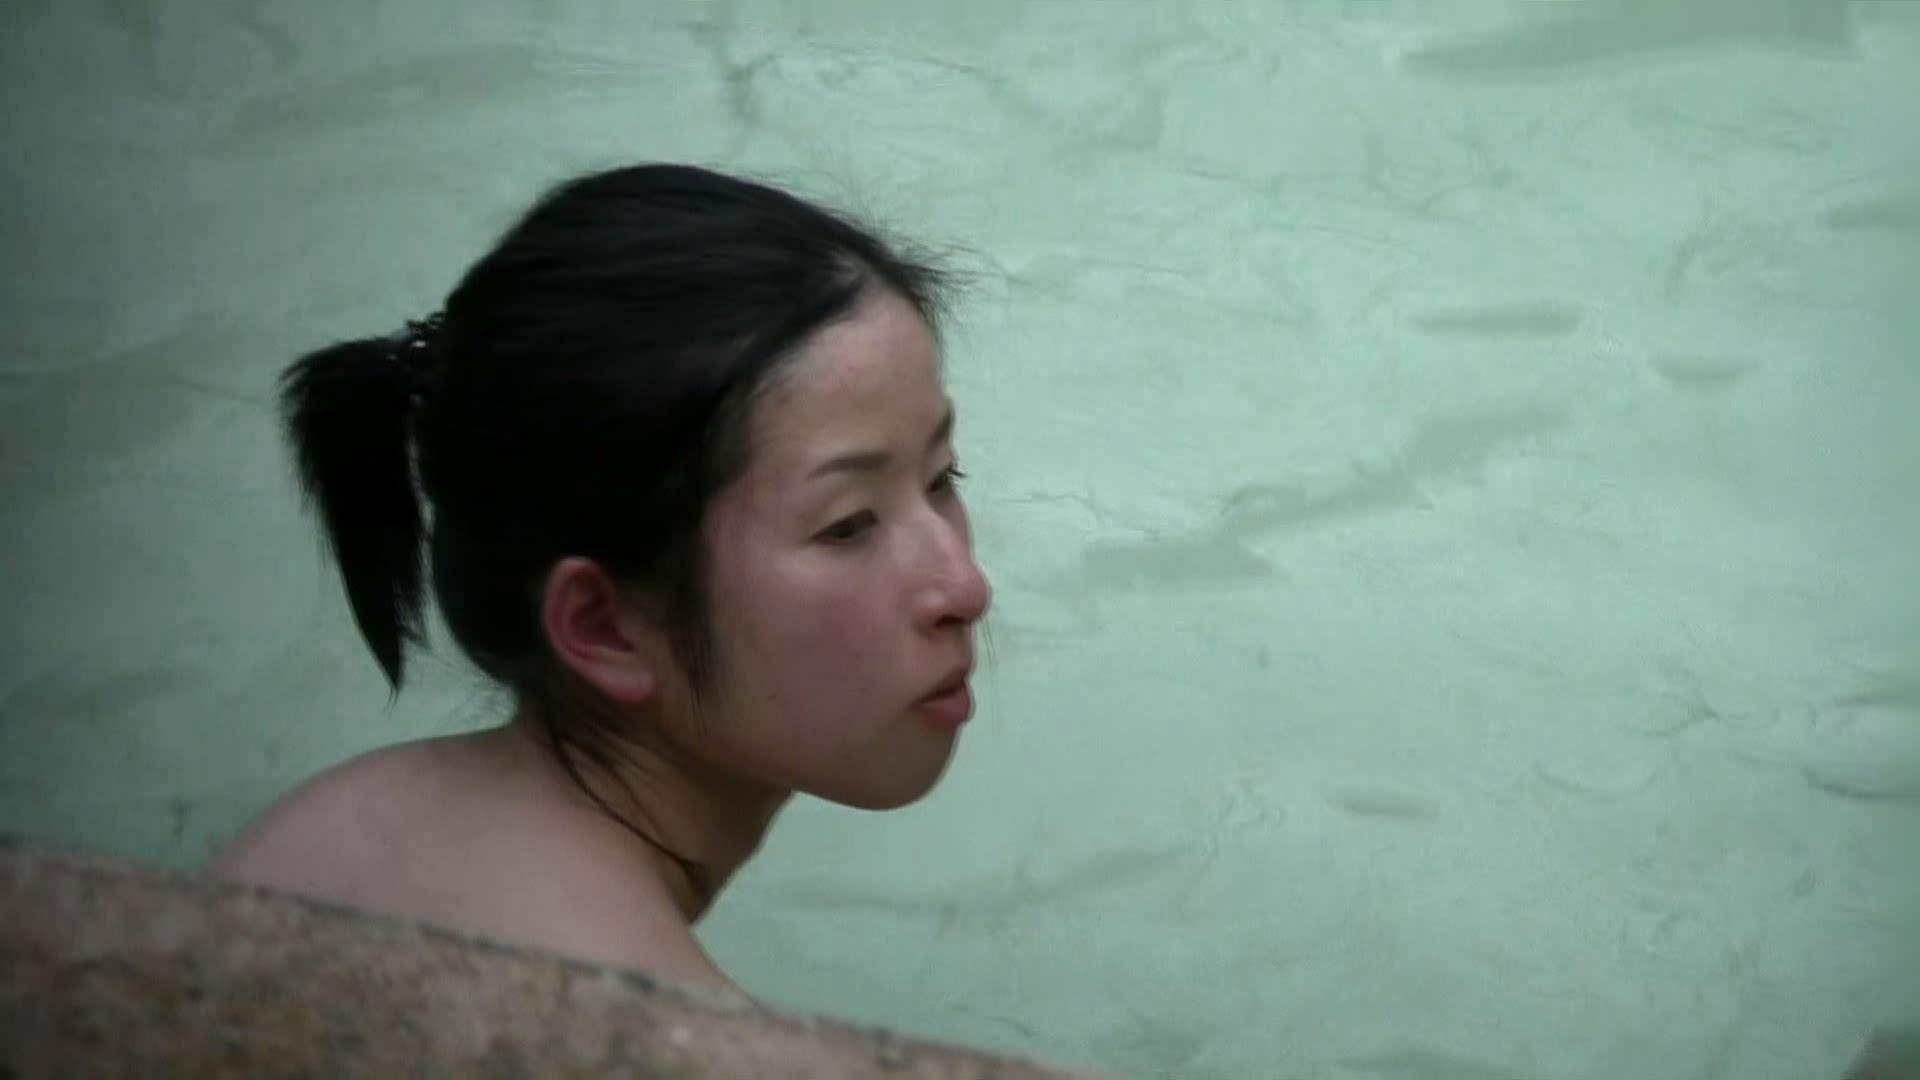 Aquaな露天風呂Vol.656 露天風呂編  91PIX 32